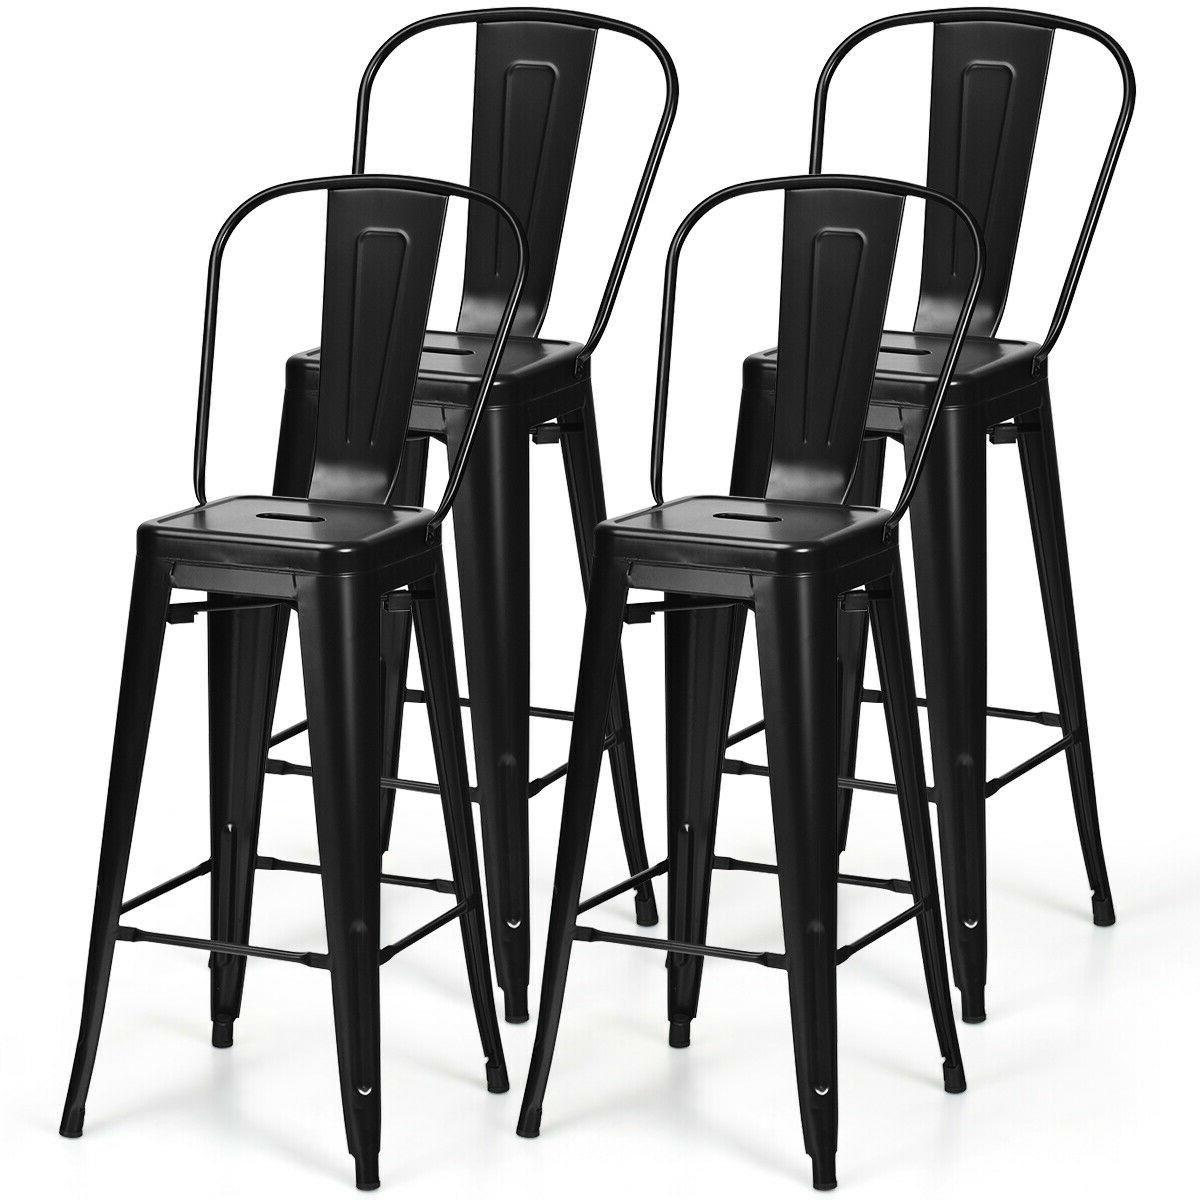 Magnificent Set Of 4 Black 30 Height High Back Metal Industrial Bar Stools Forskolin Free Trial Chair Design Images Forskolin Free Trialorg